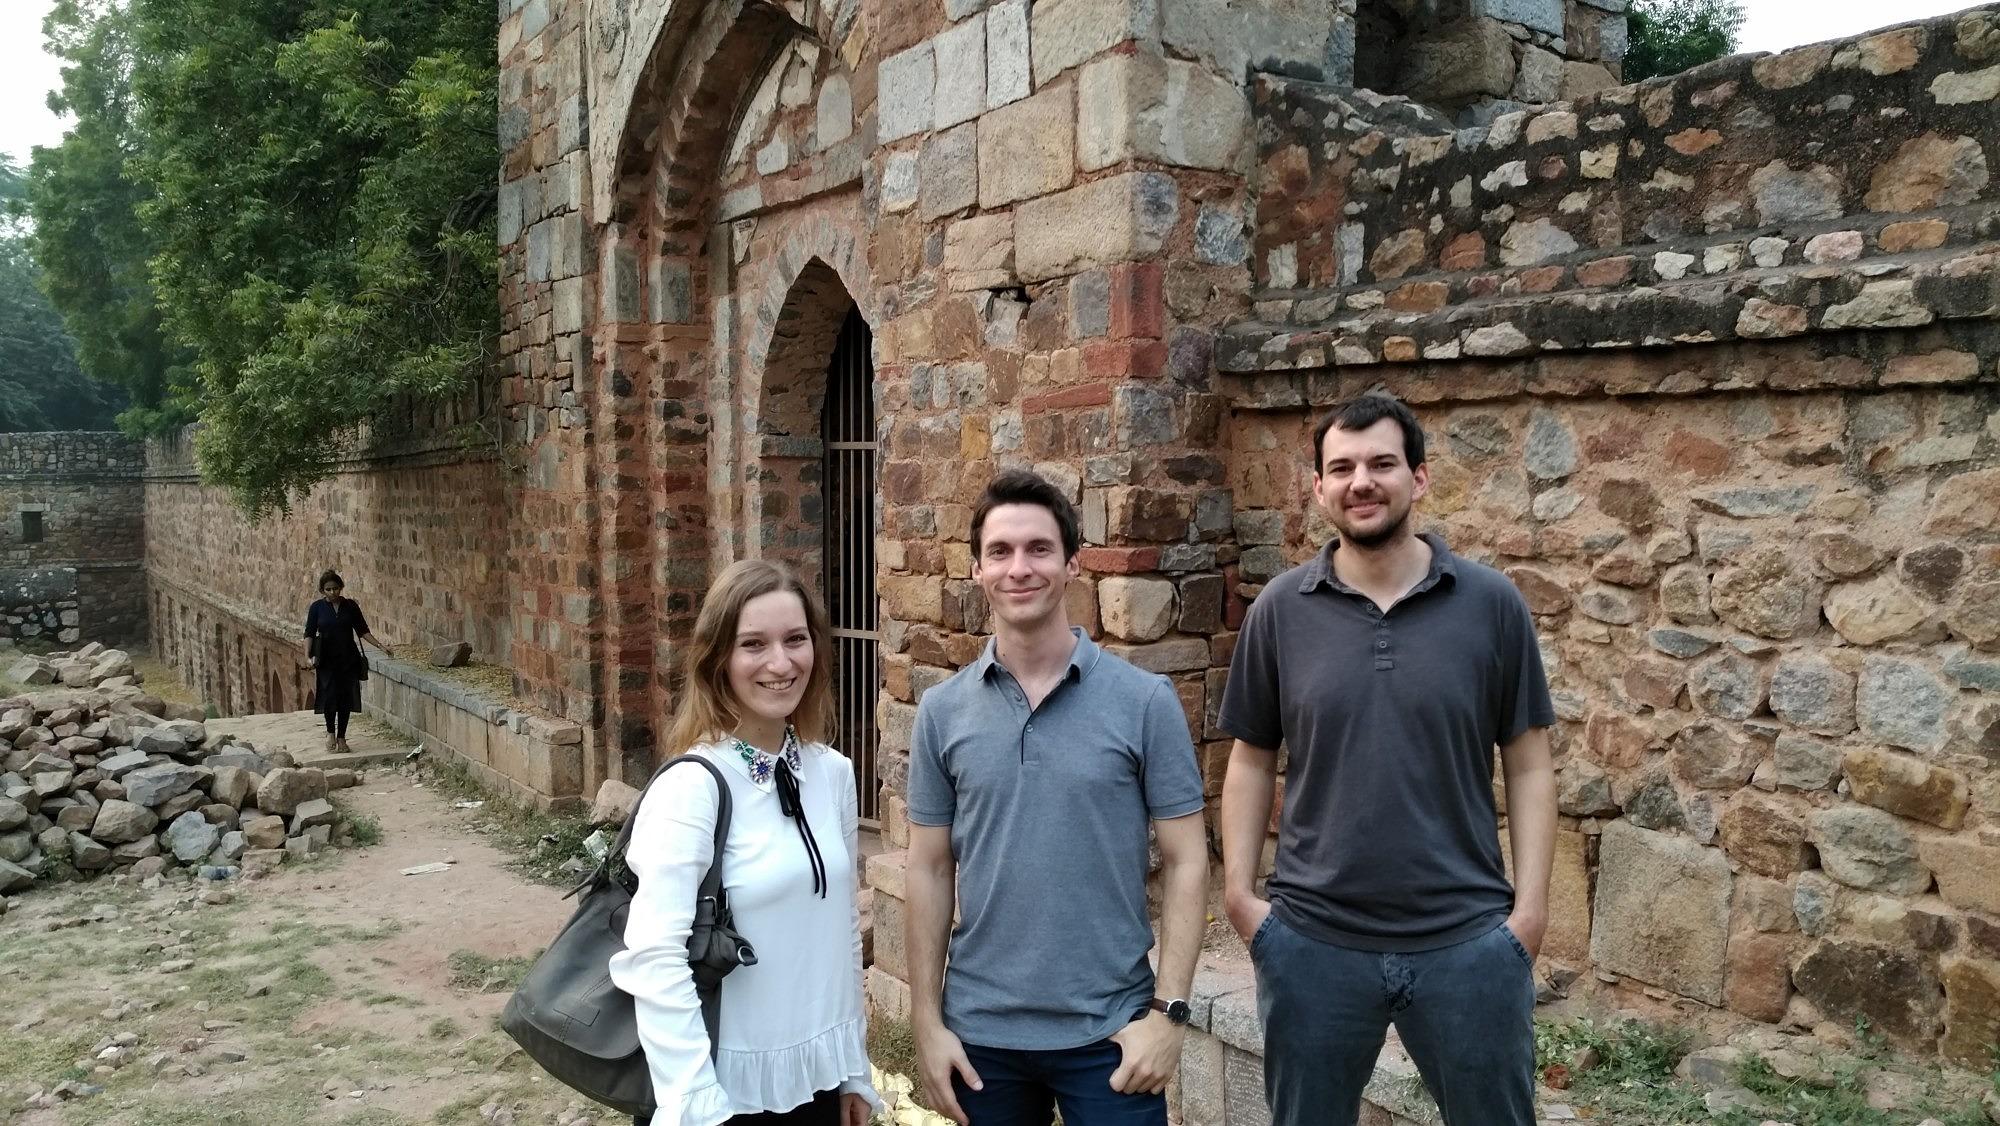 Group photo of three researchers from the technical faculties at Friedrich-Alexander-Universität Erlangen-Nürnberg visiting the Lodhi Garden.